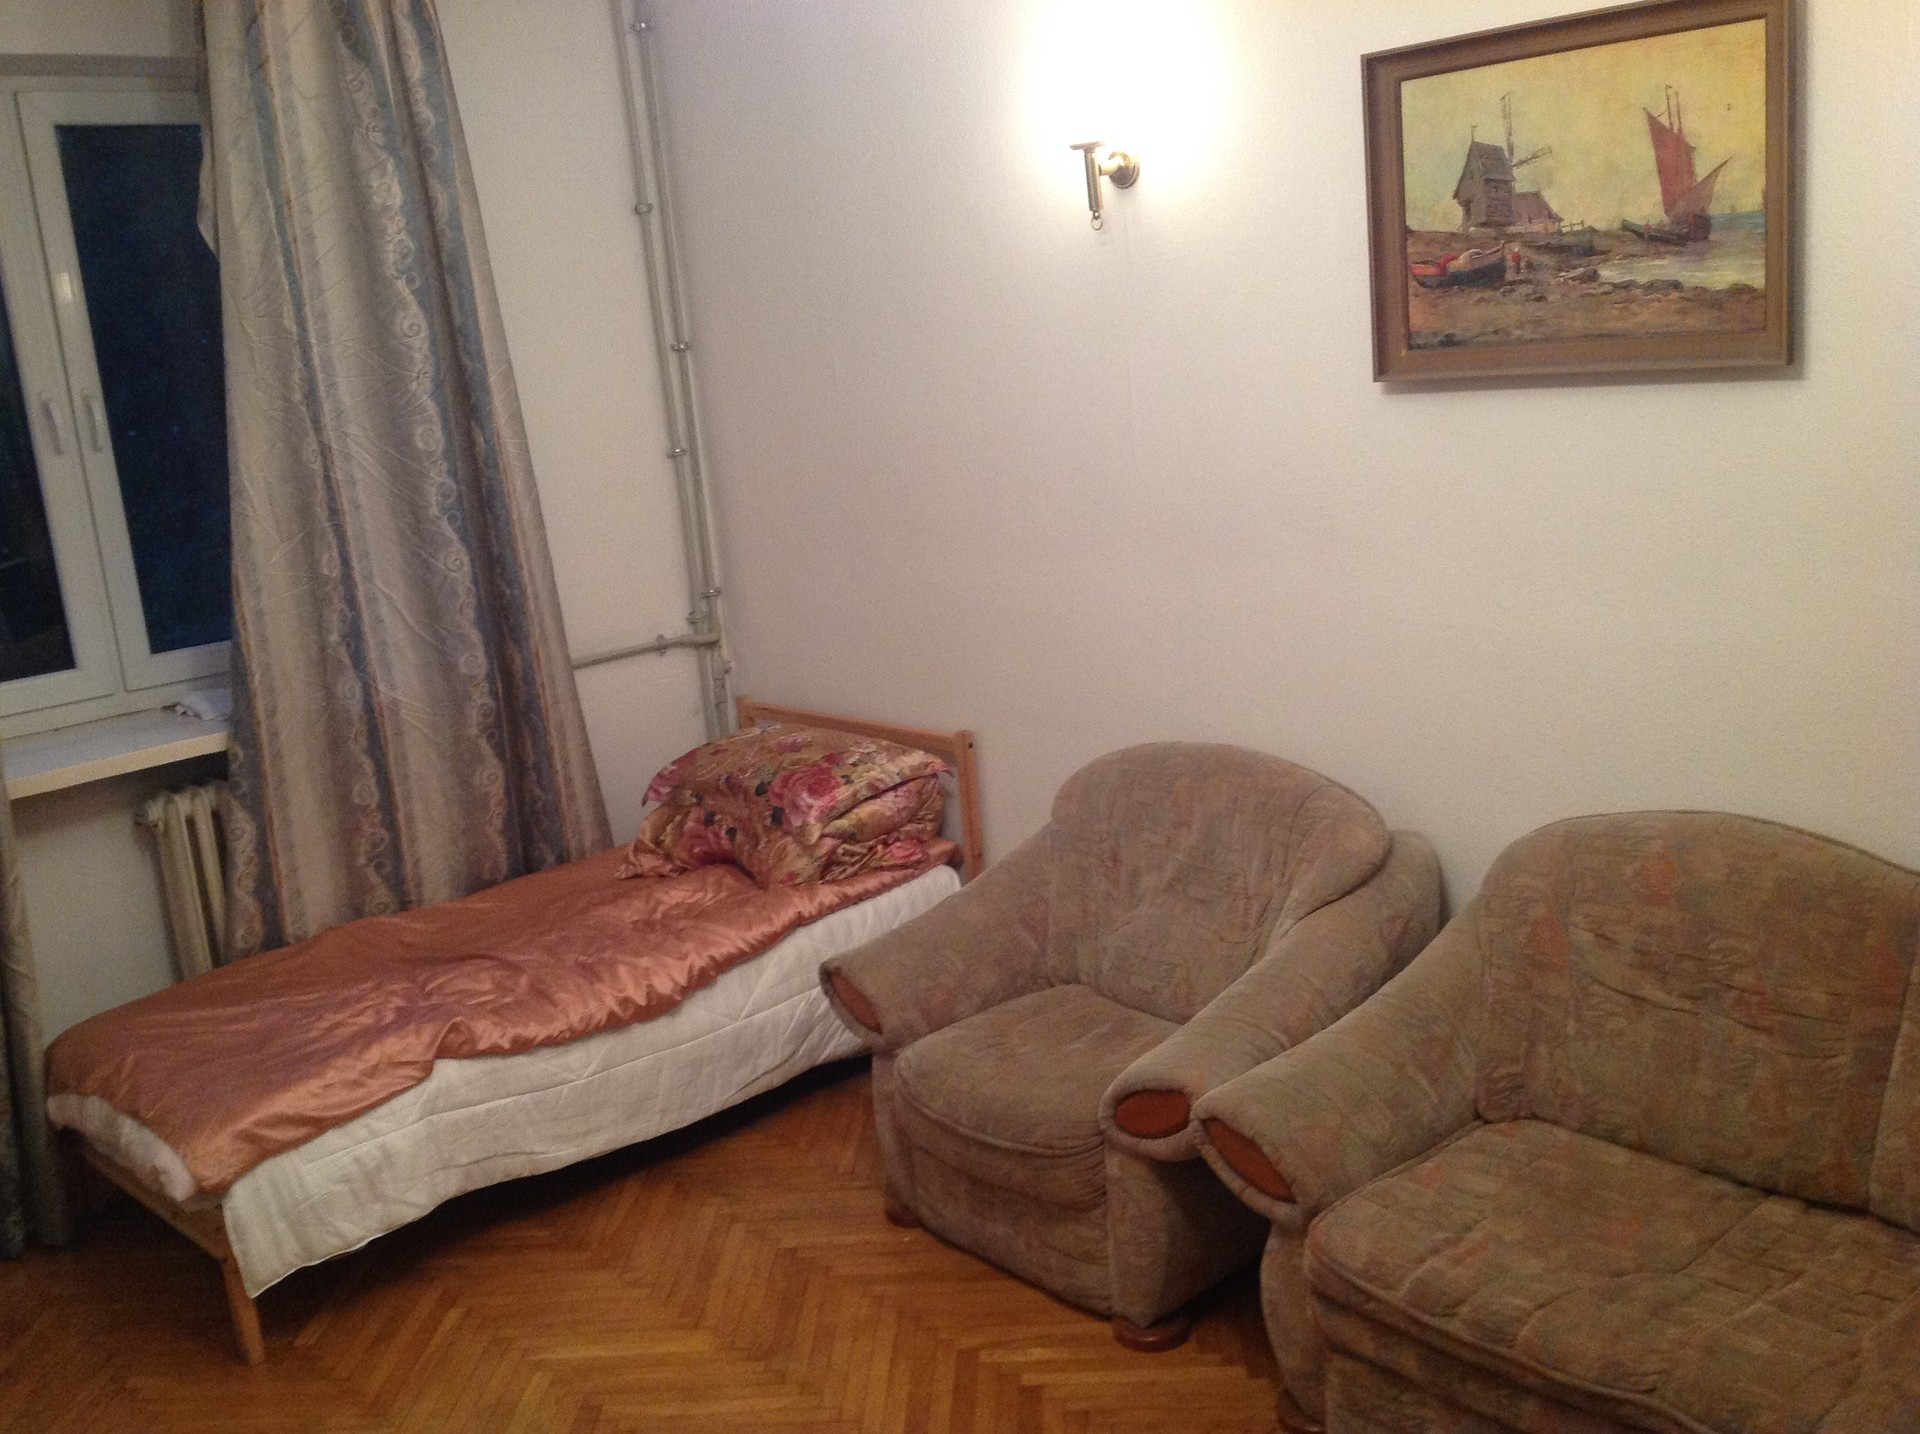 spacious-room-pretty-location-warsaw-2a0e2f8c7fc6505b9515ef0ad73d6b8c